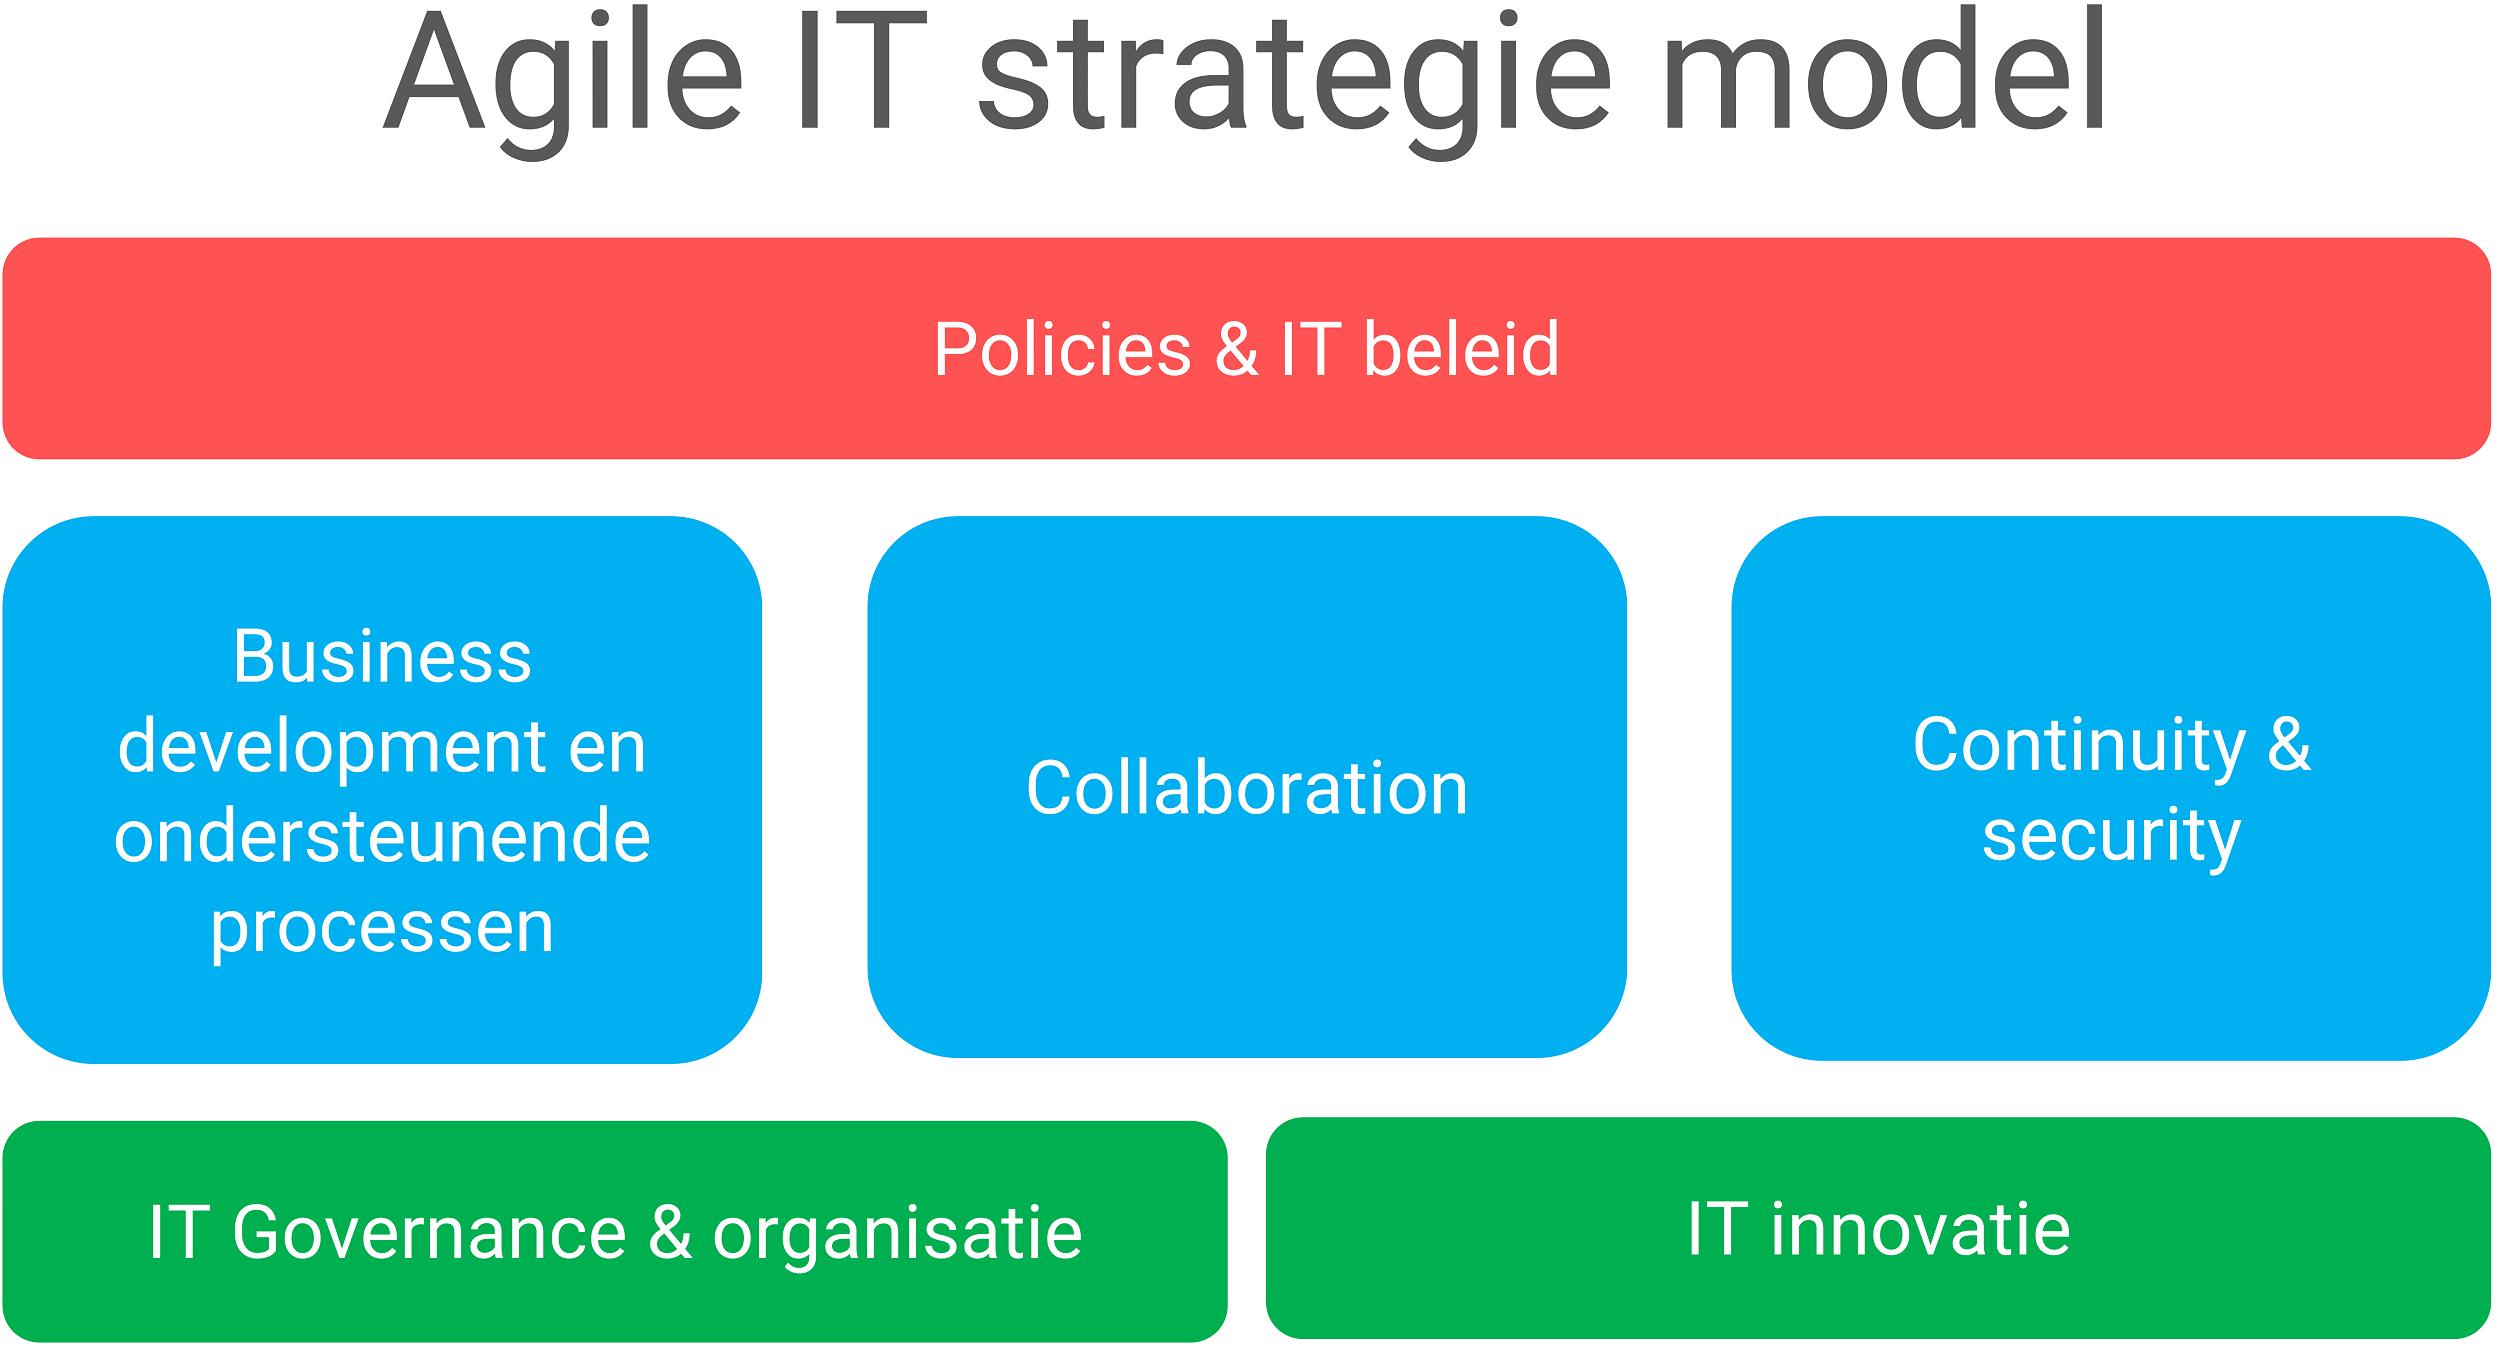 Agile IT strategie modelmatig weergegeven